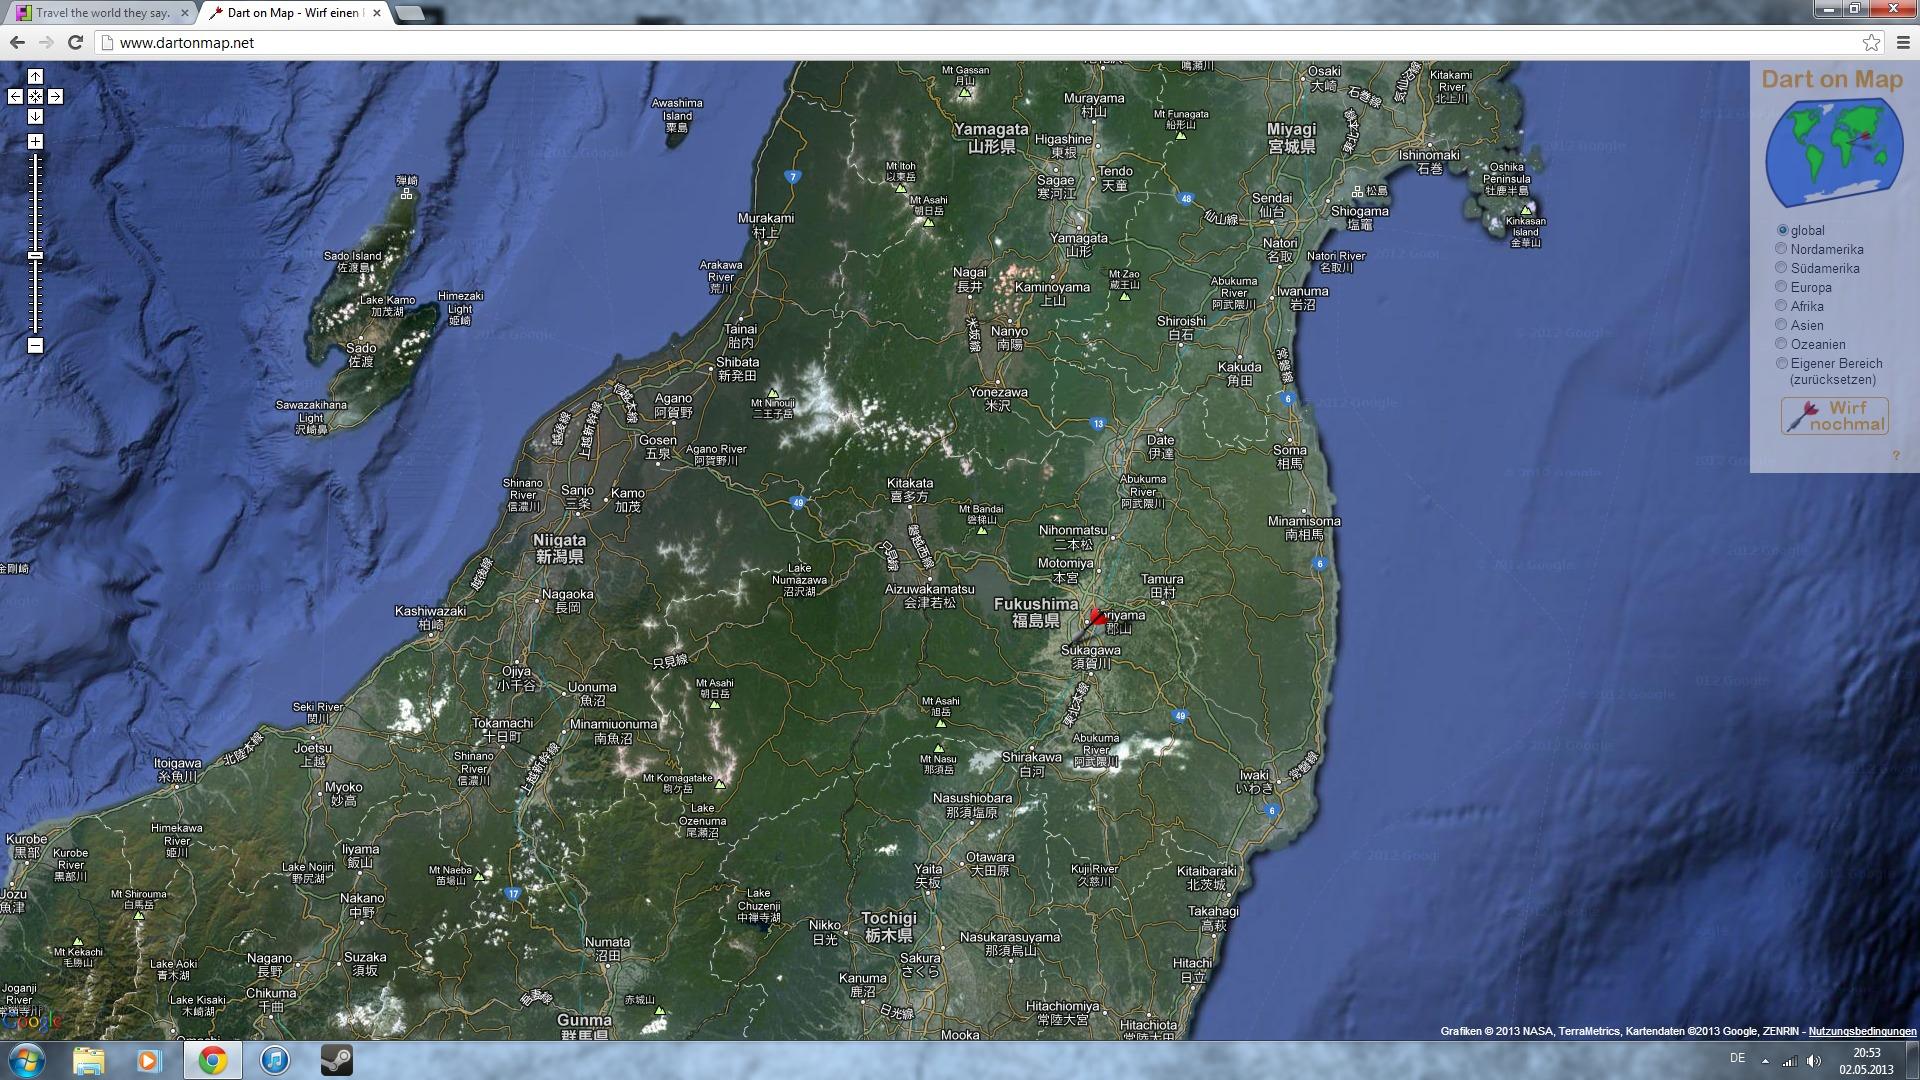 Ushima World Map Map Get Free Image About World Maps - World map us and japan